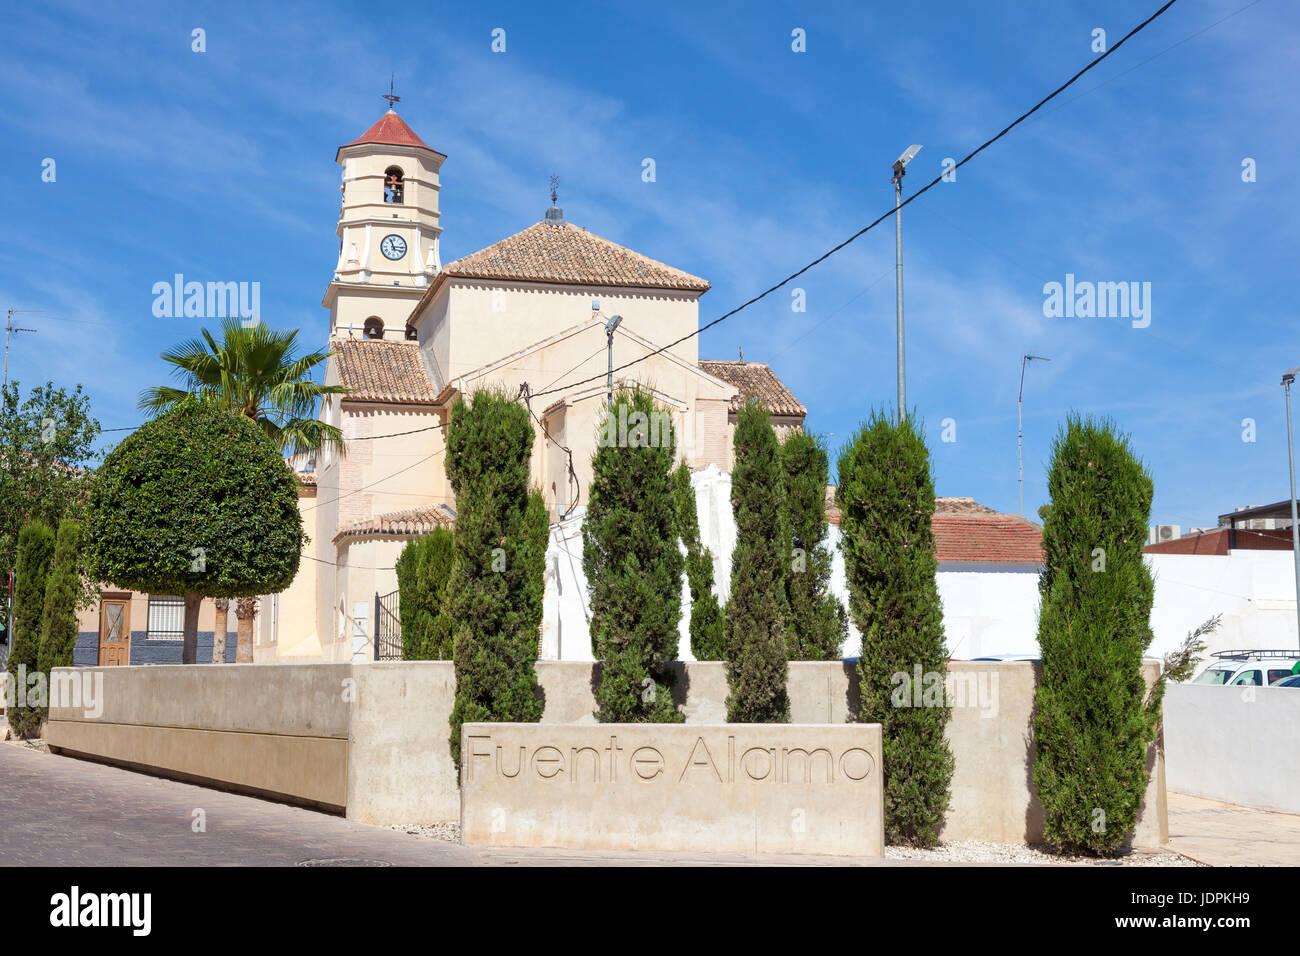 Church in historic town Fuente Alamo de Murcia, region of Murcia, Spain - Stock Image